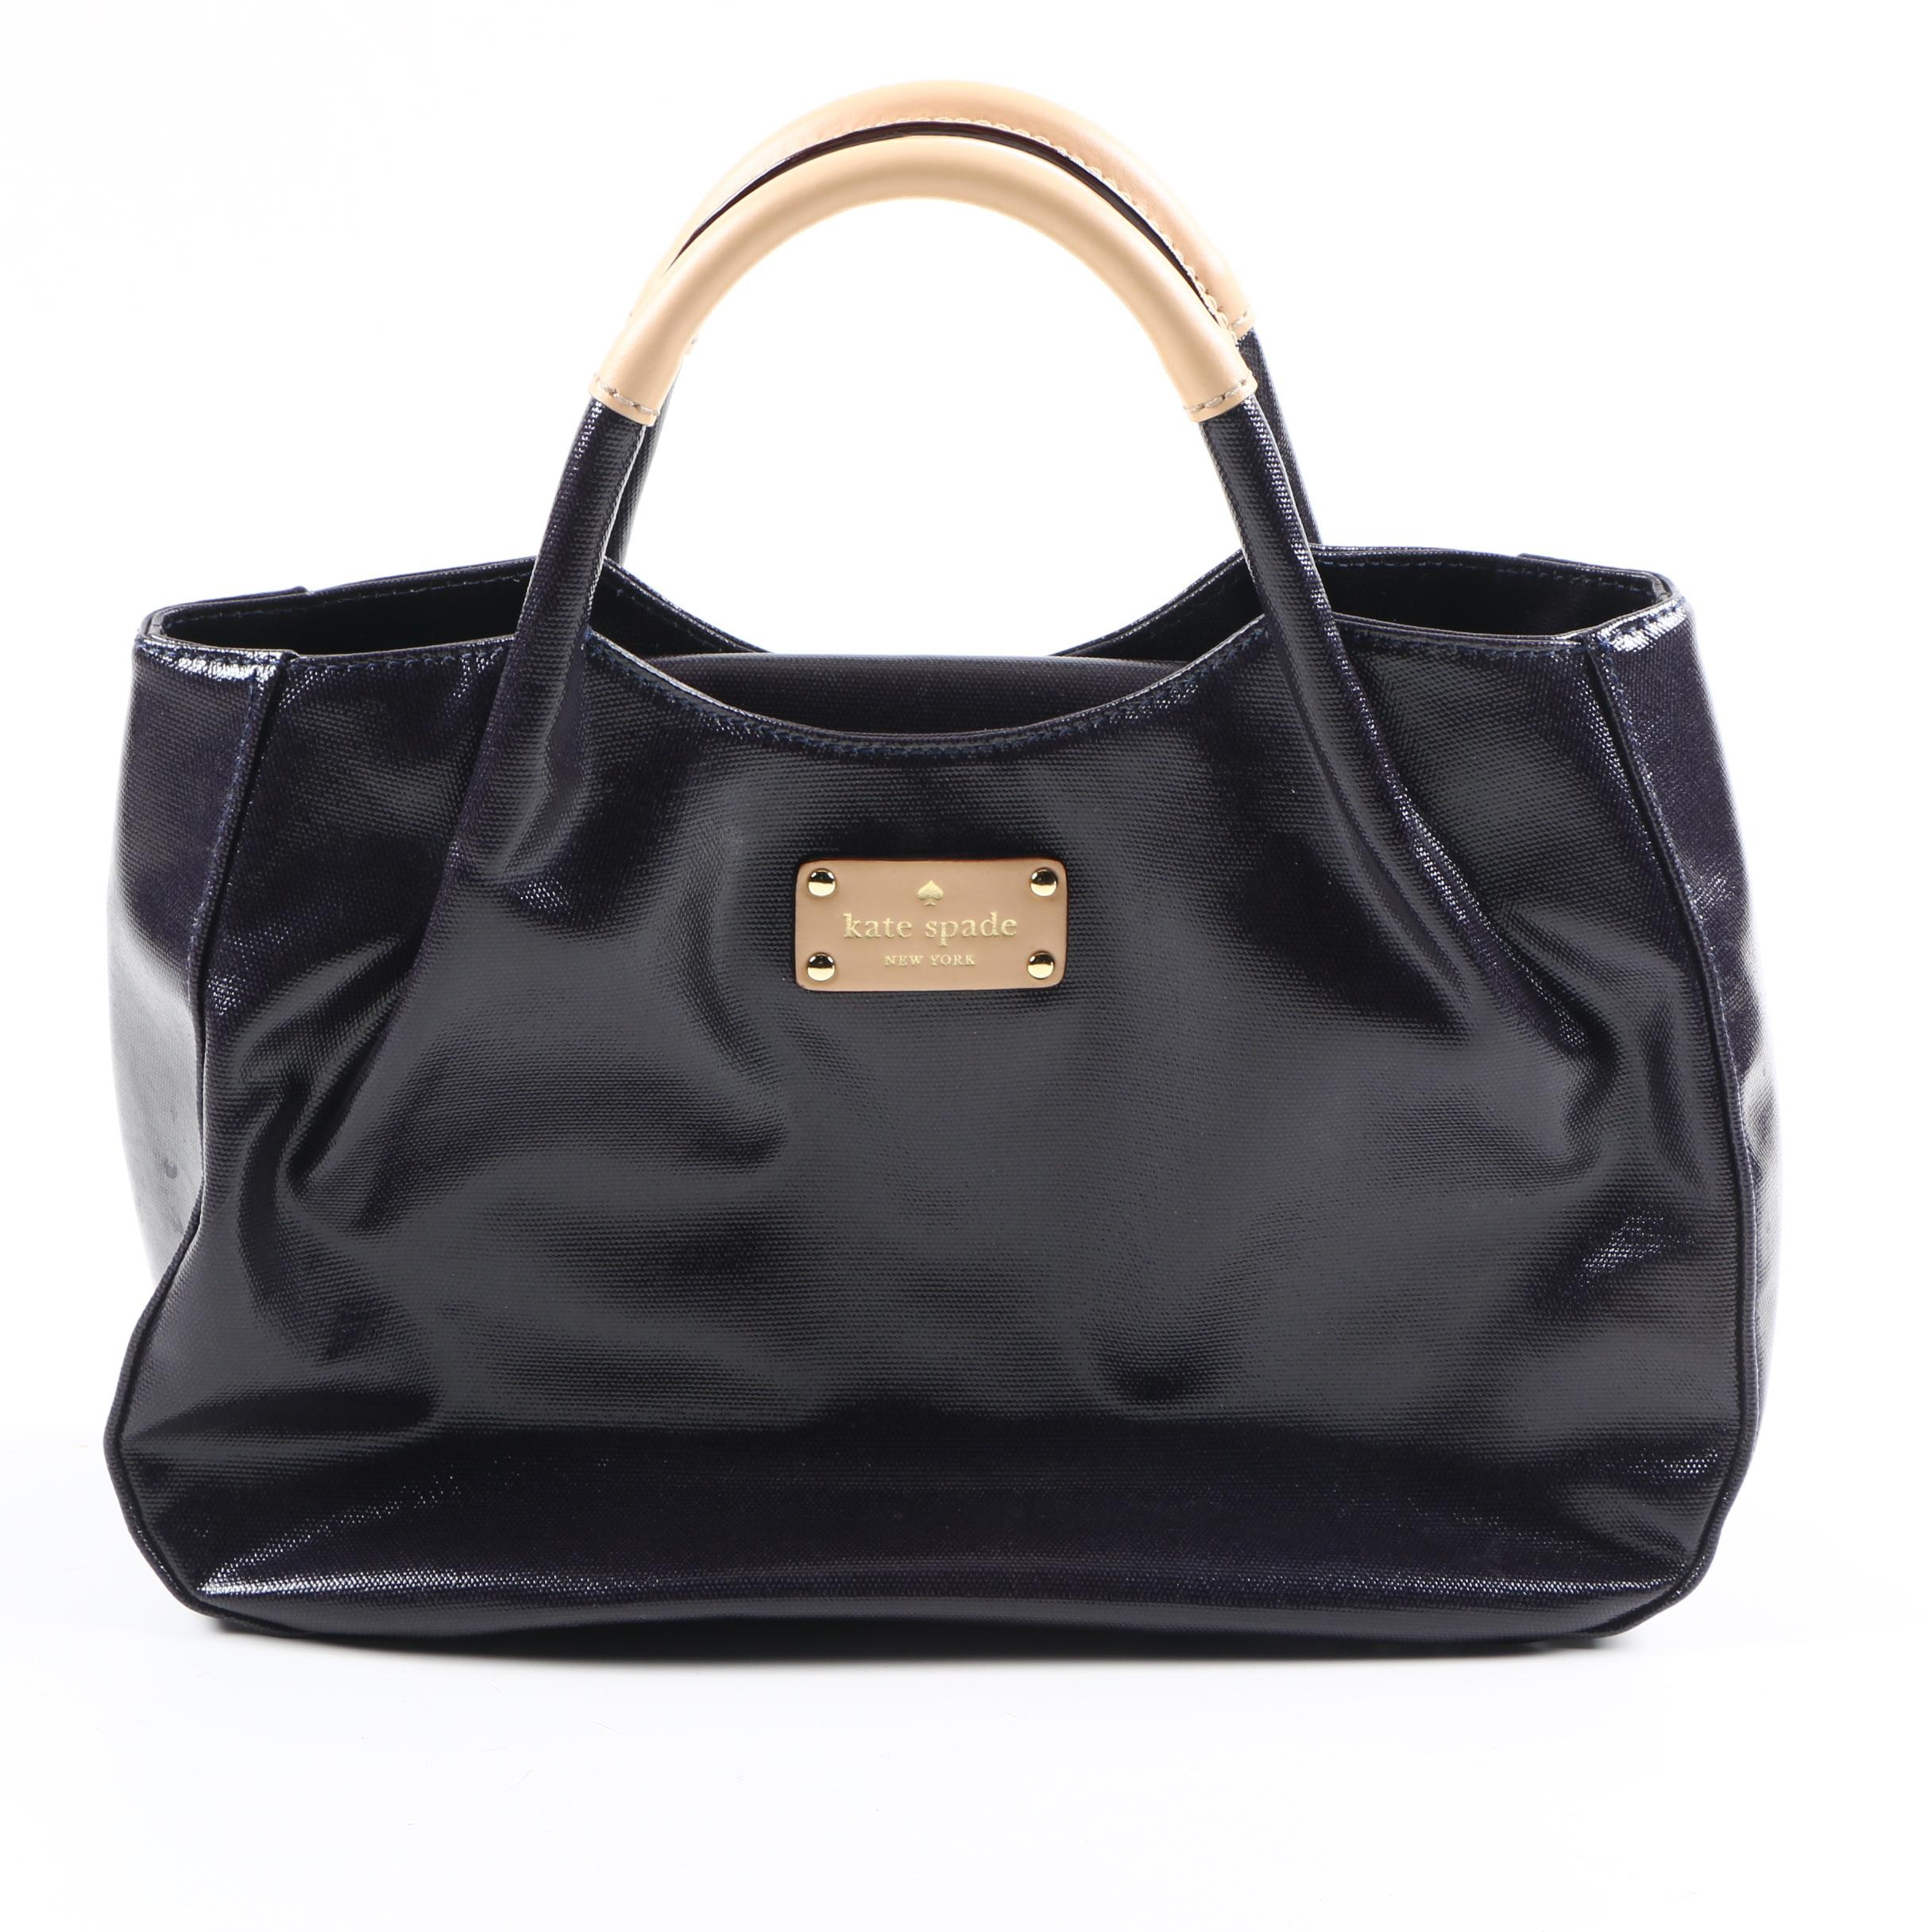 Kate Spade Coated Canvas Handbag